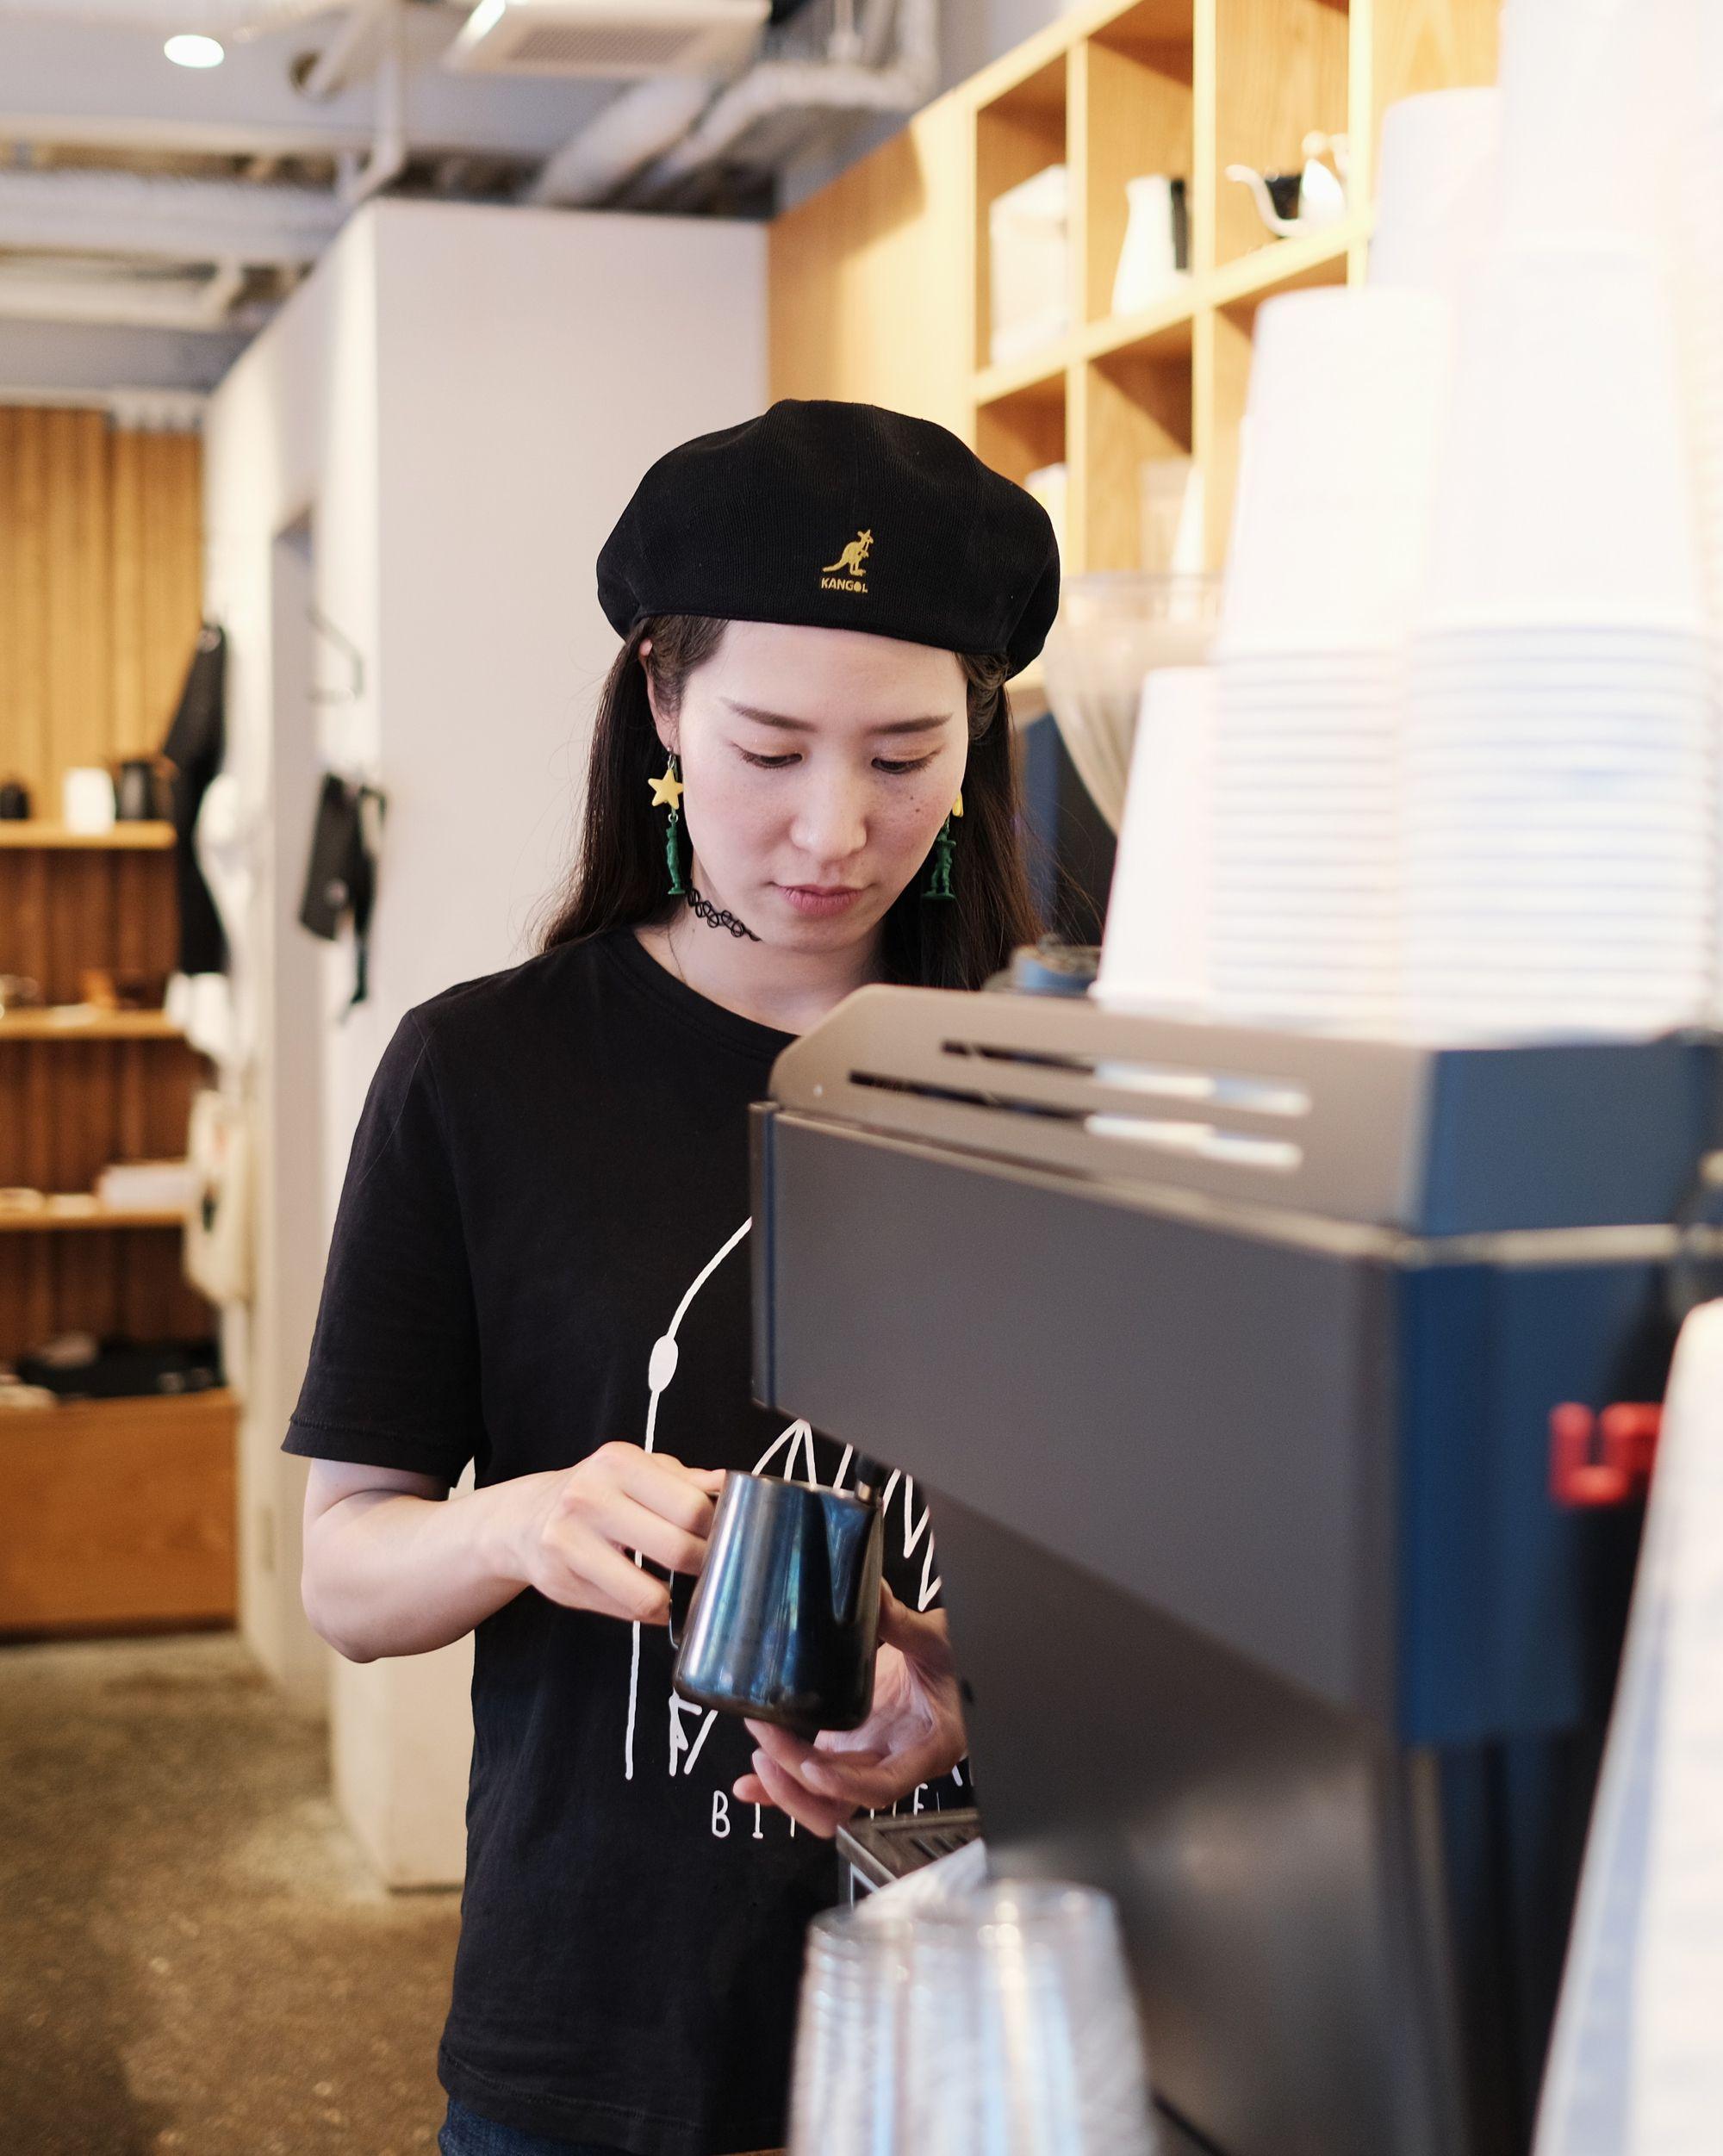 Good Morning Coffee Lovers Enjoy A Cup At Kurasu おはようございます 今朝も美味しい一杯を Kurasuで 2020 バリスタ メルボルン バンクーバー